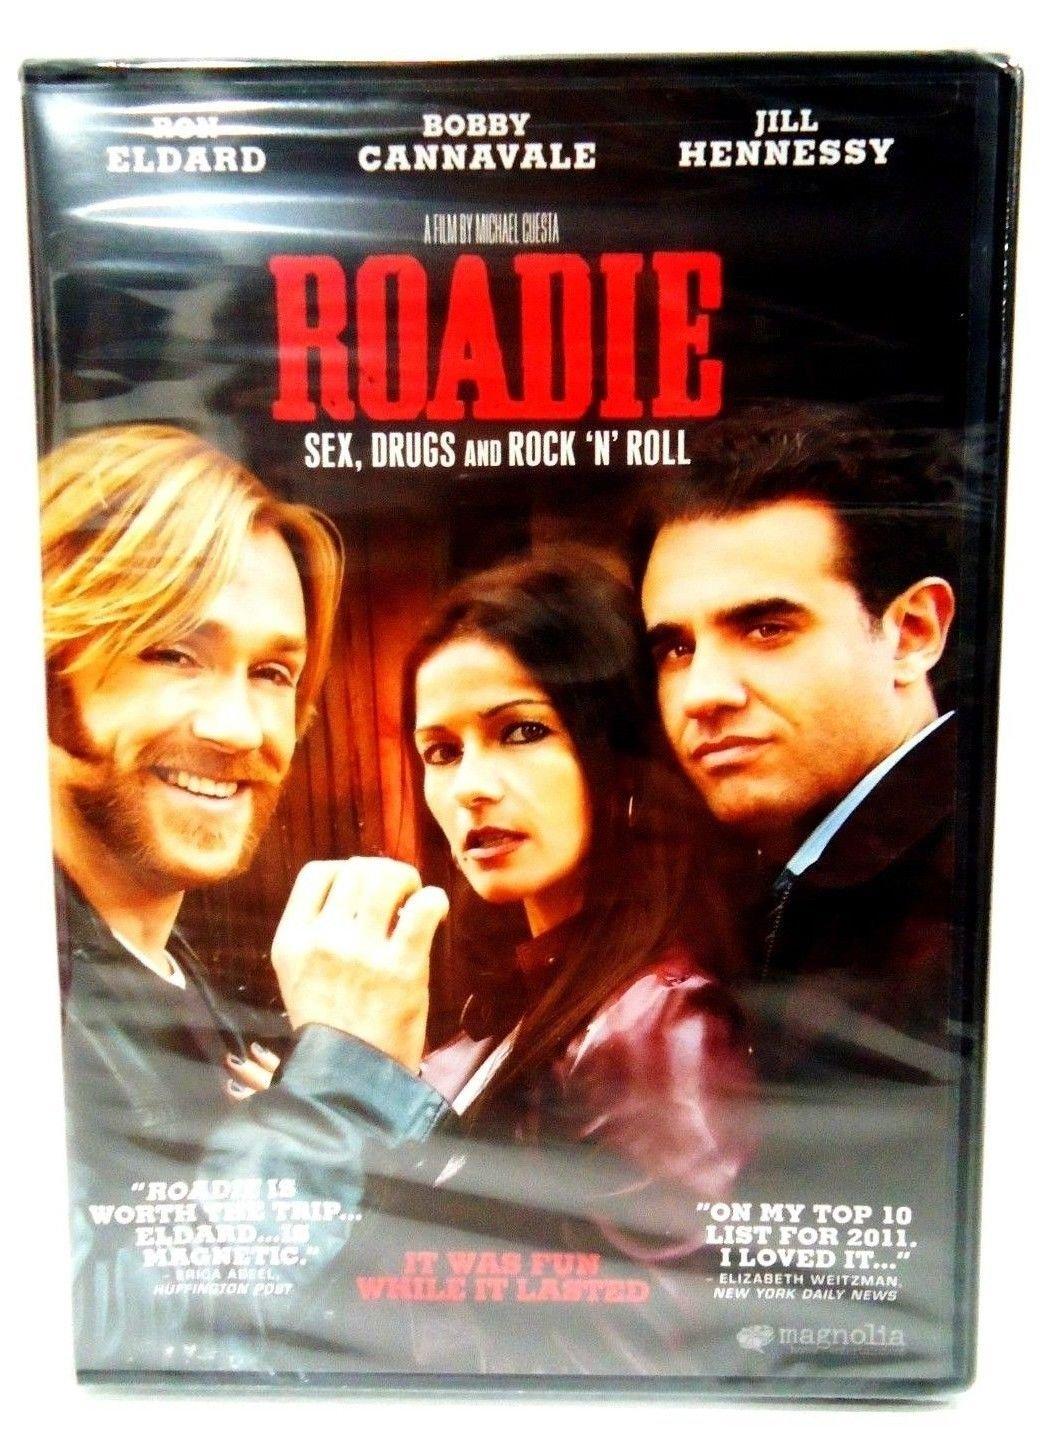 ROADIE - DVD - RON ELDARD - JILL HENNESSY - NEW - ROCK & ROLL - MUSIC - MOVIE